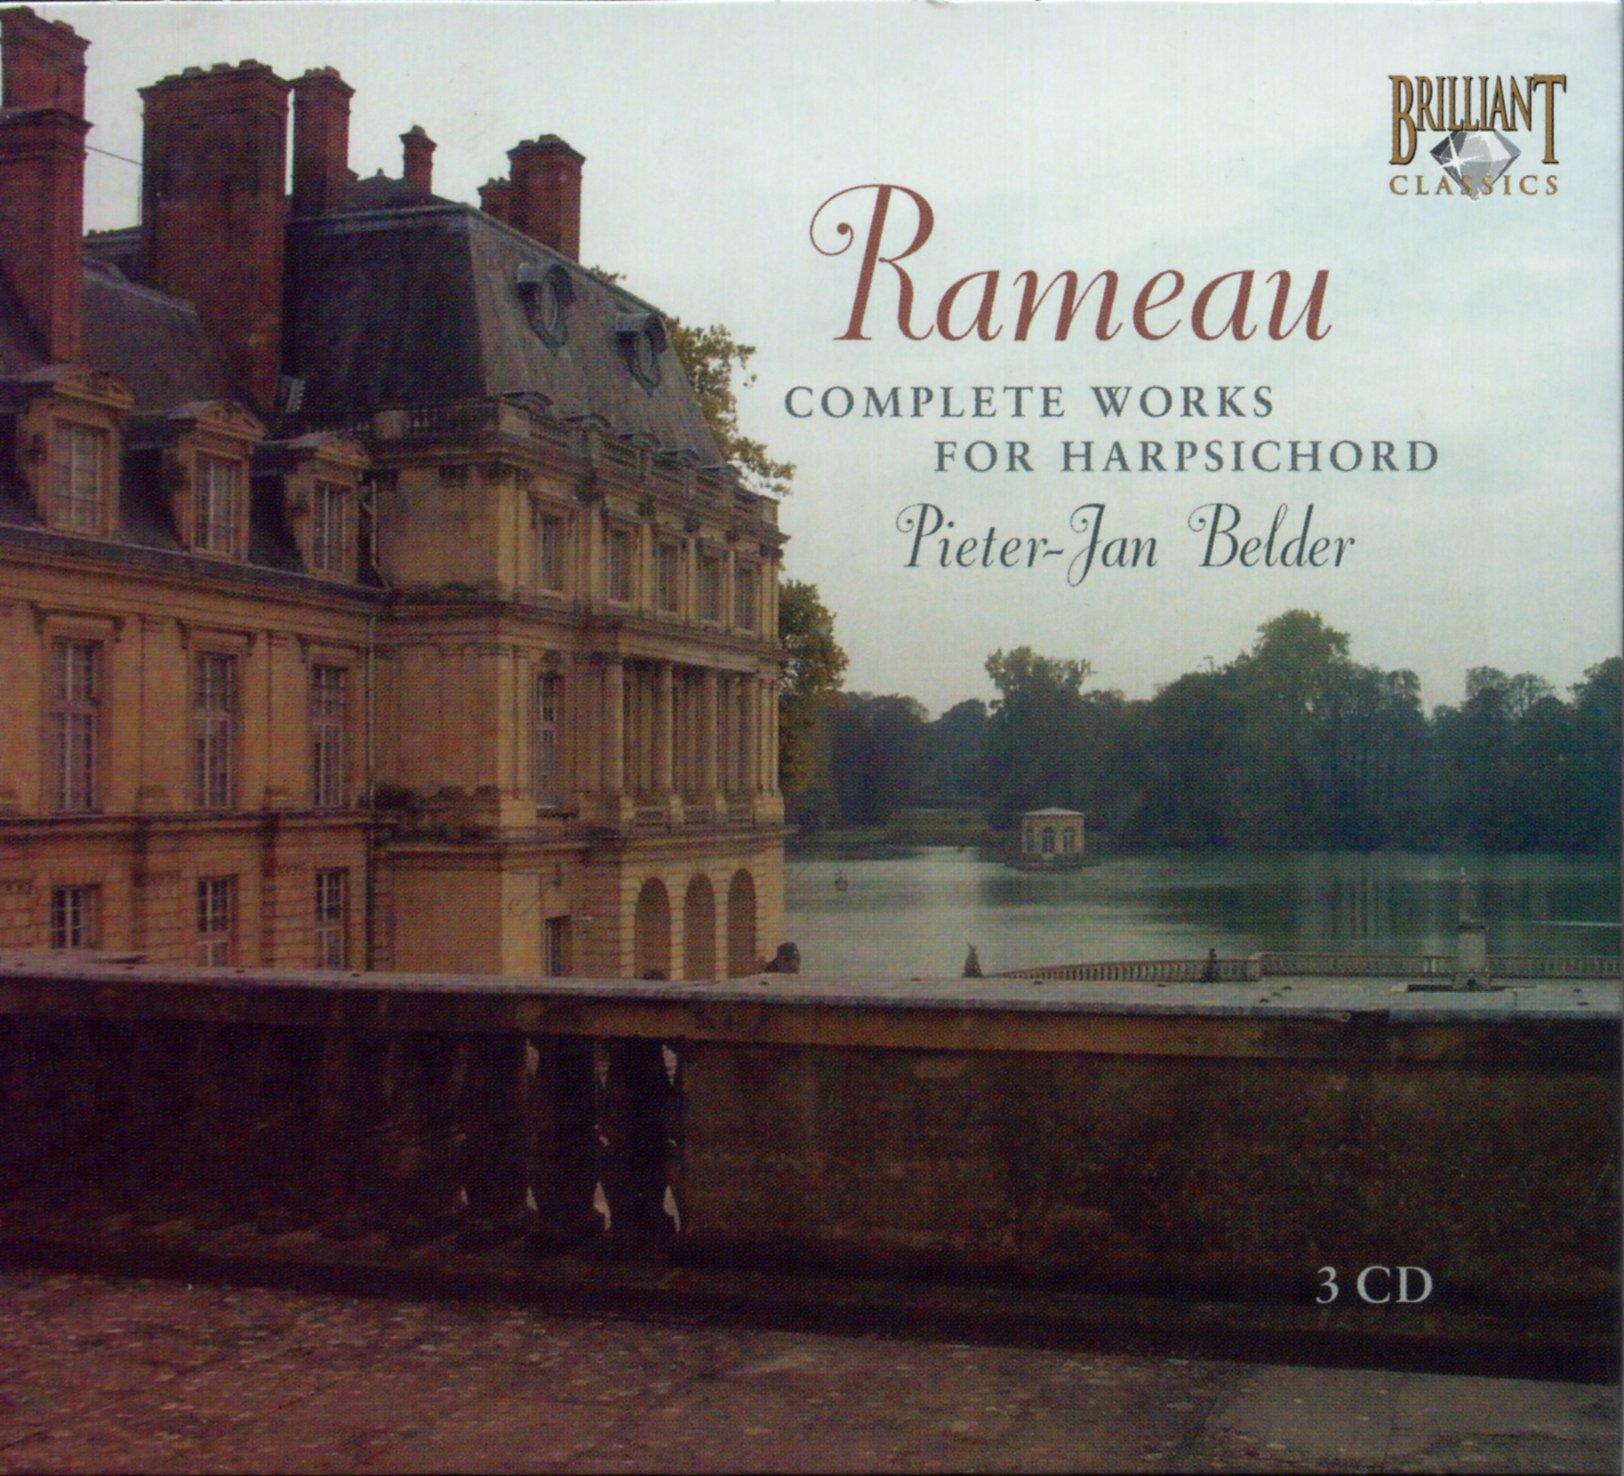 CD : Pieter-Jan Belder - Complete Harpsichord Works (Boxed Set)